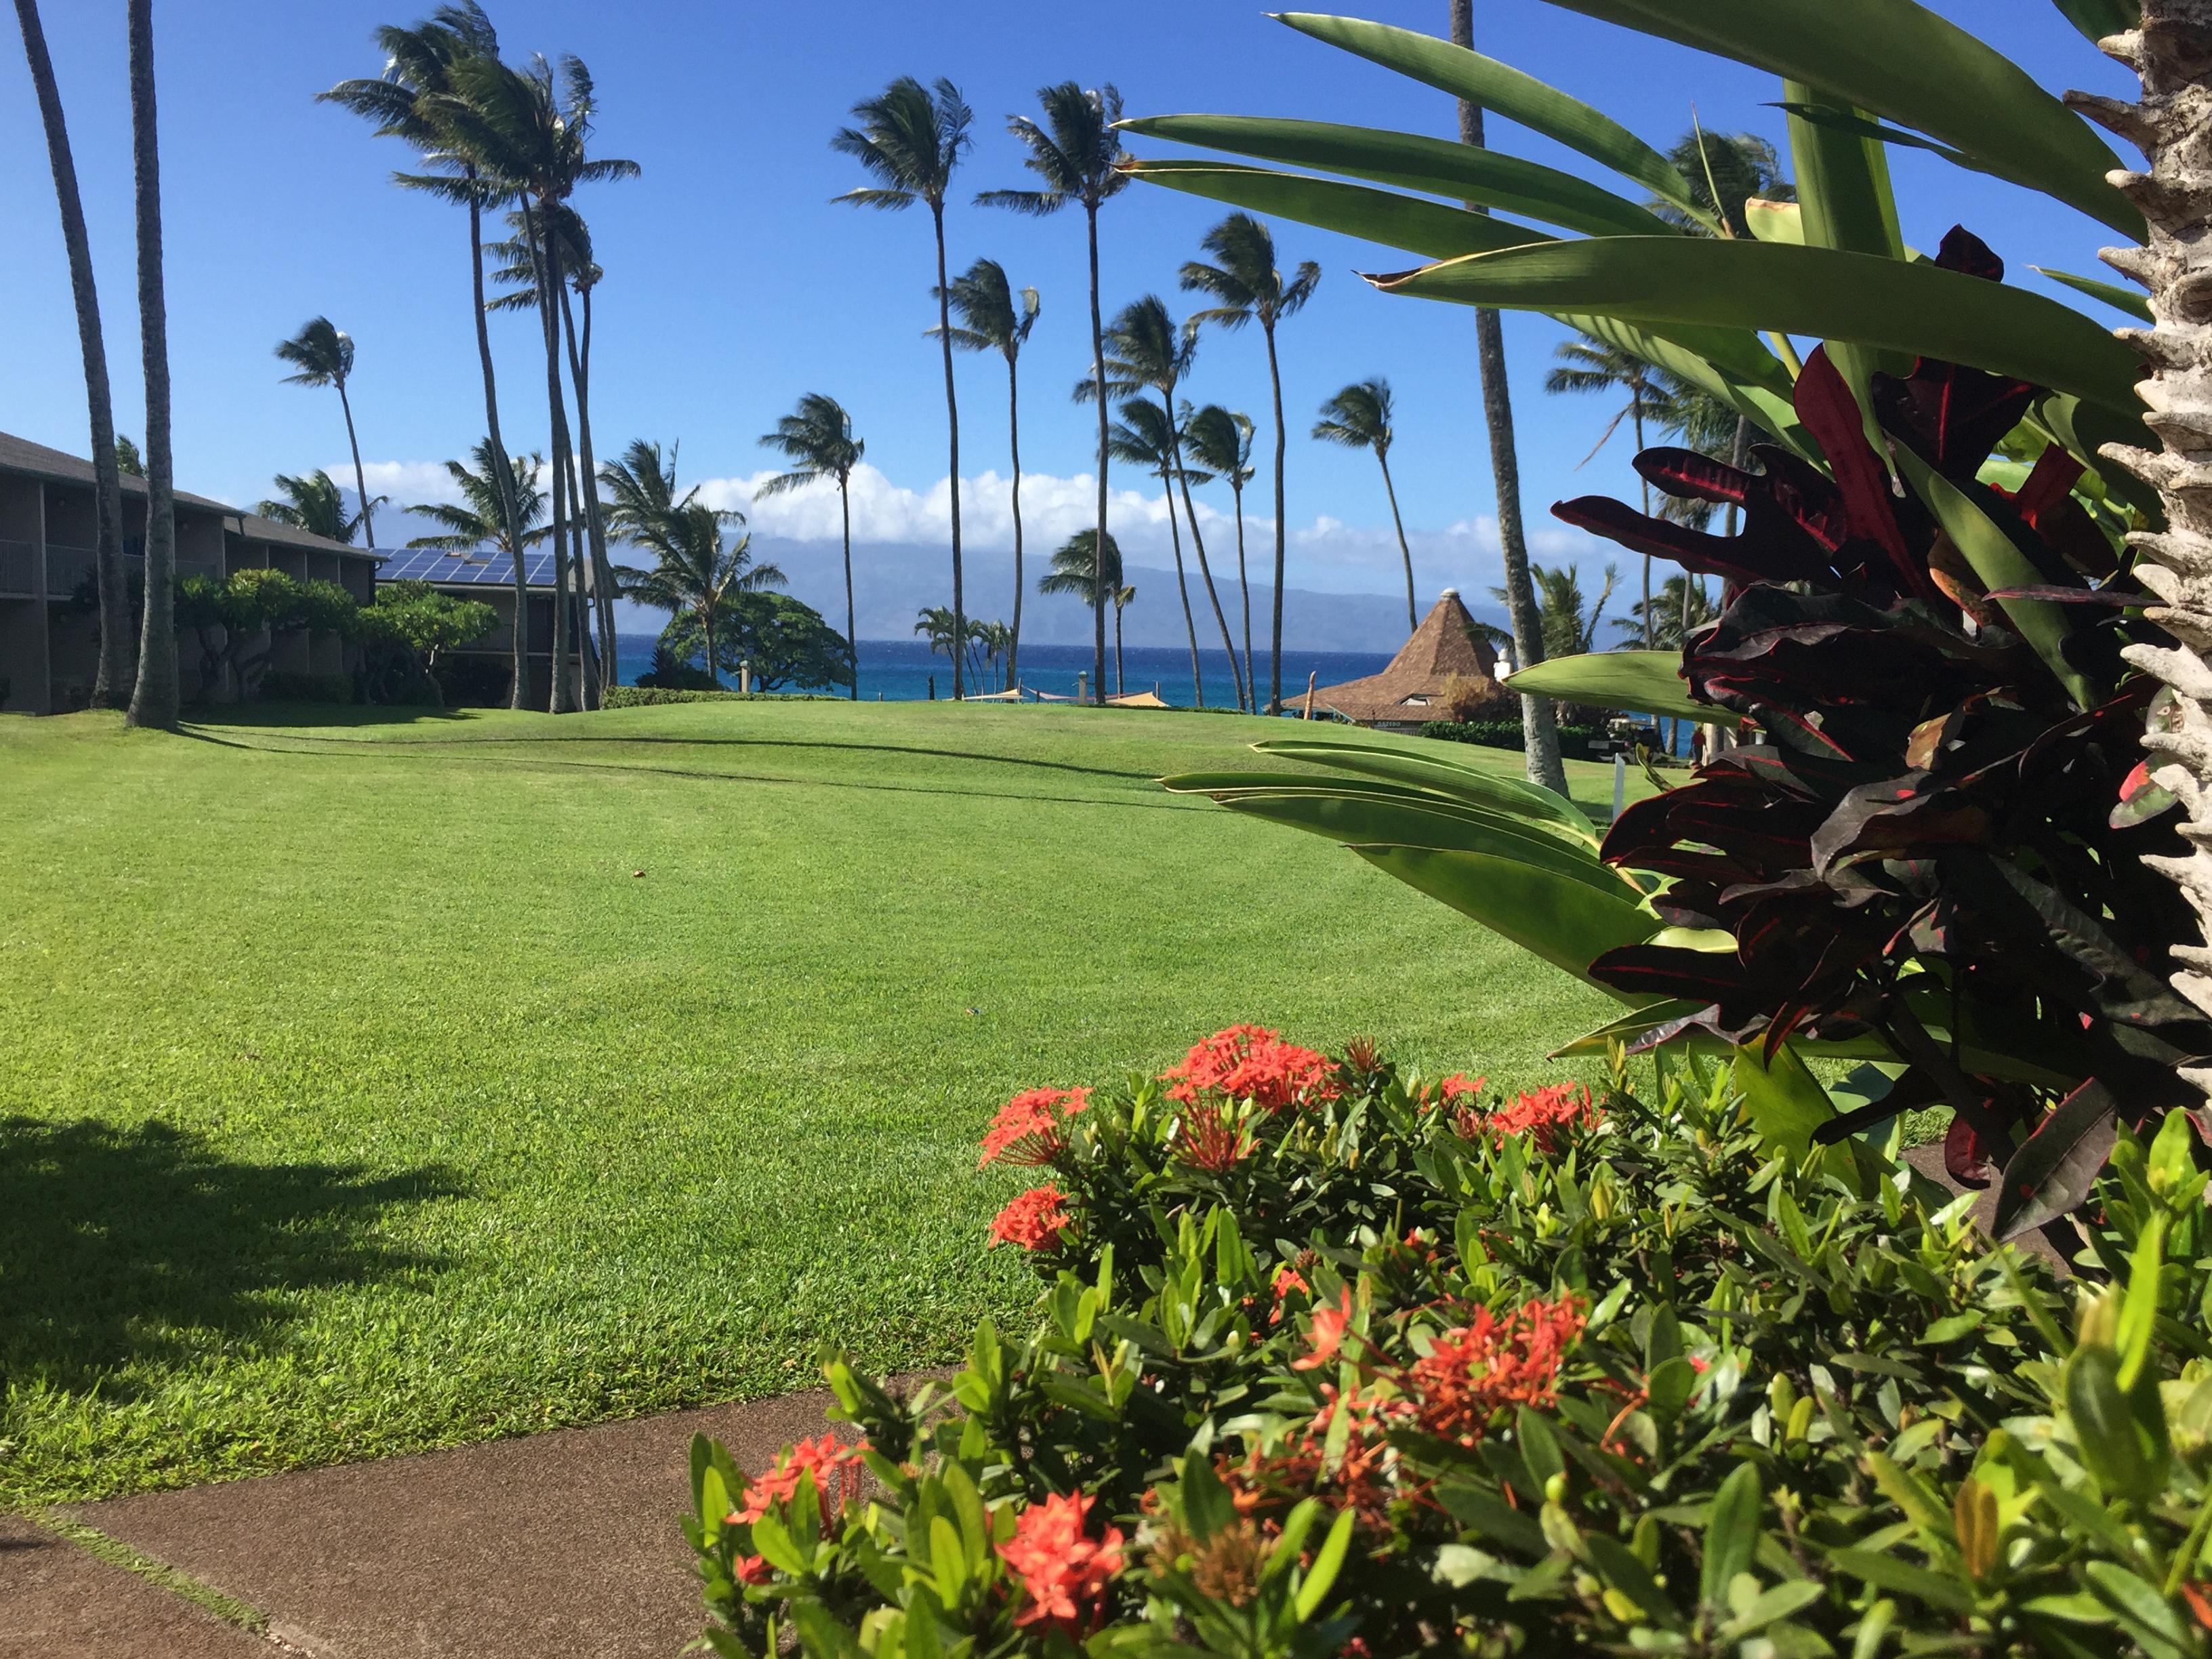 Resort landscaping